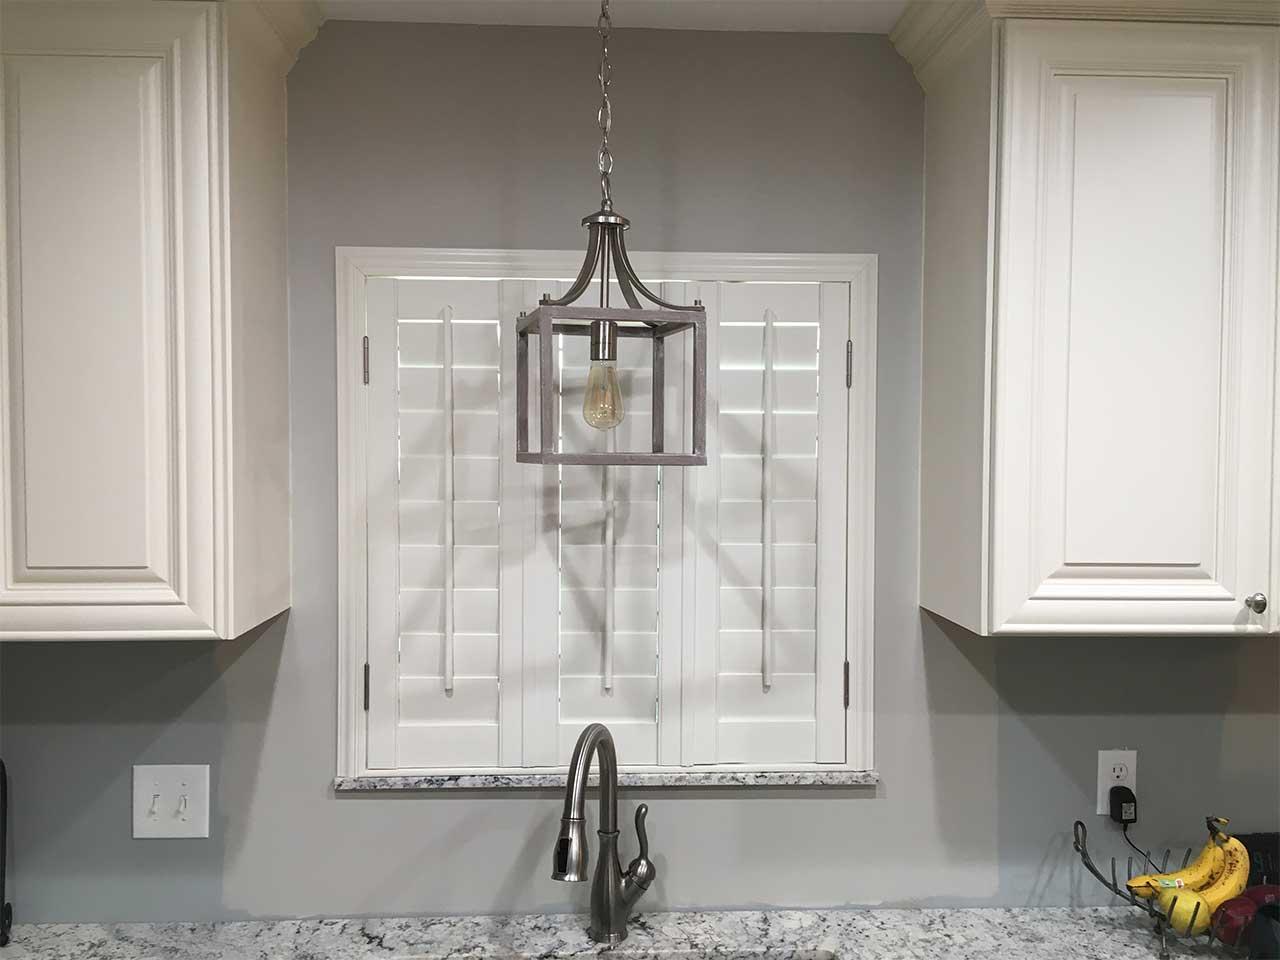 3 panel plantation shutters